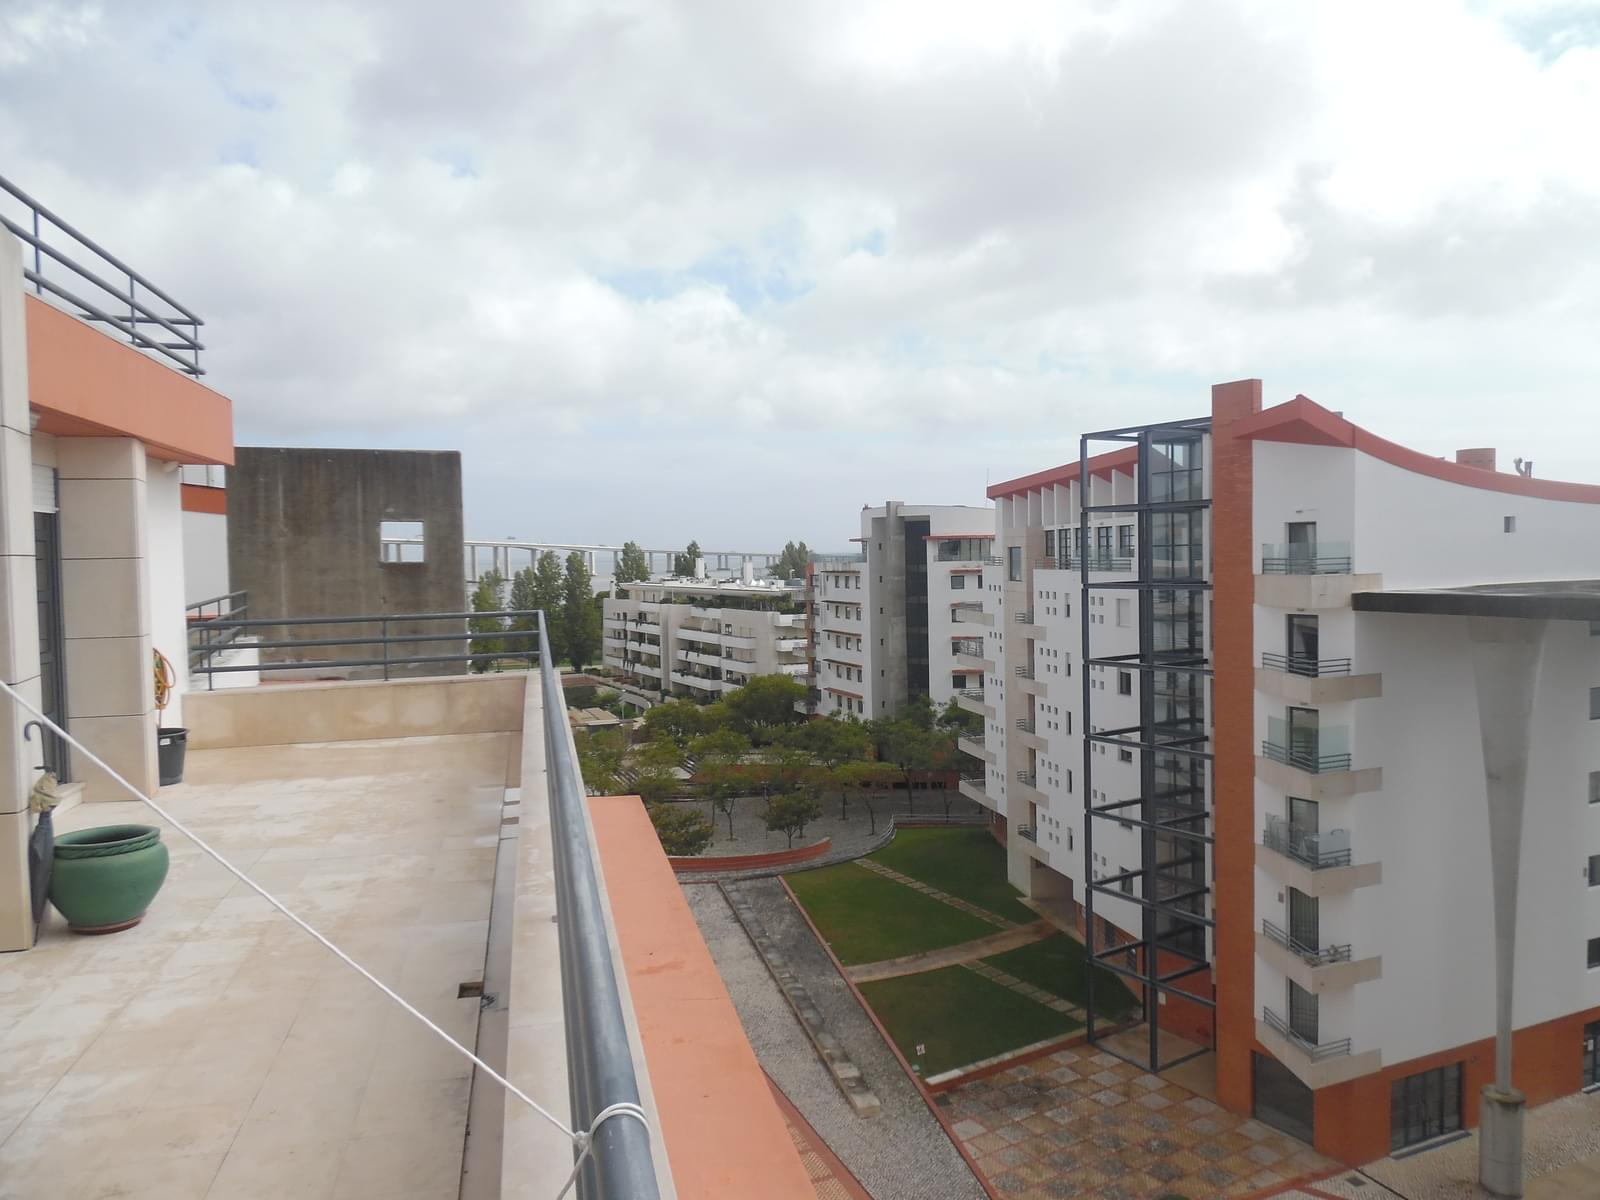 pf18329-apartamento-t1-lisboa-ef9bc5fd-381f-49da-95d0-4c1c7e83f2c0